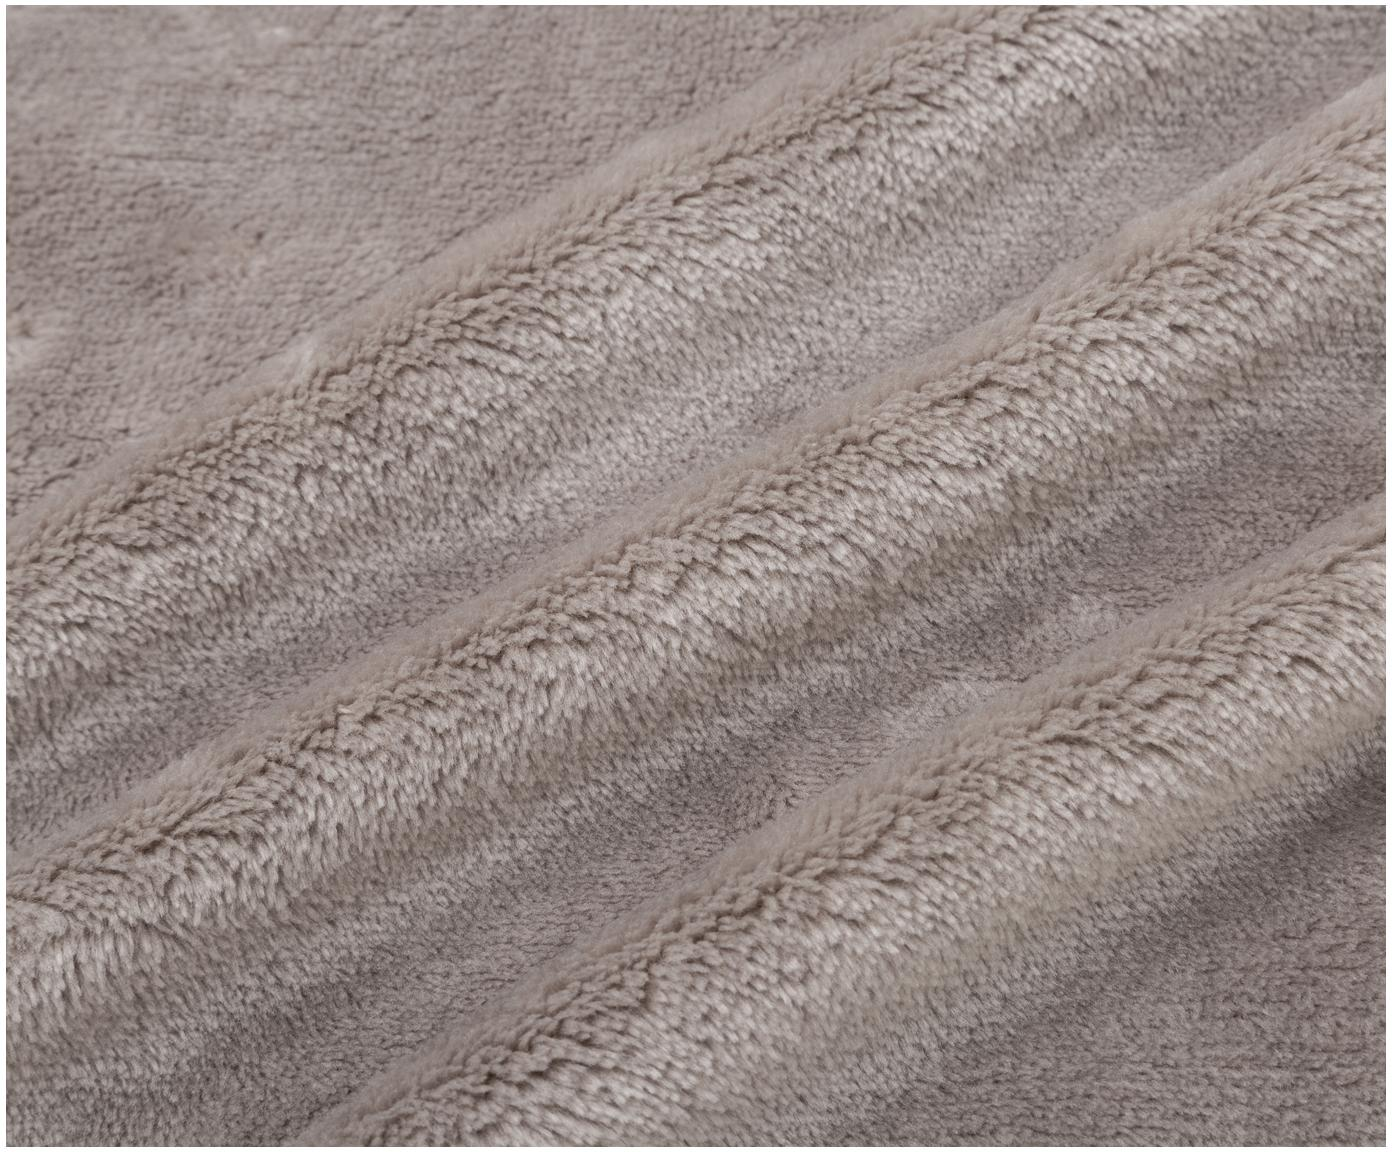 Fleece-Plaid Bomla, 100% Polyester, Taupe, 130 x 170 cm